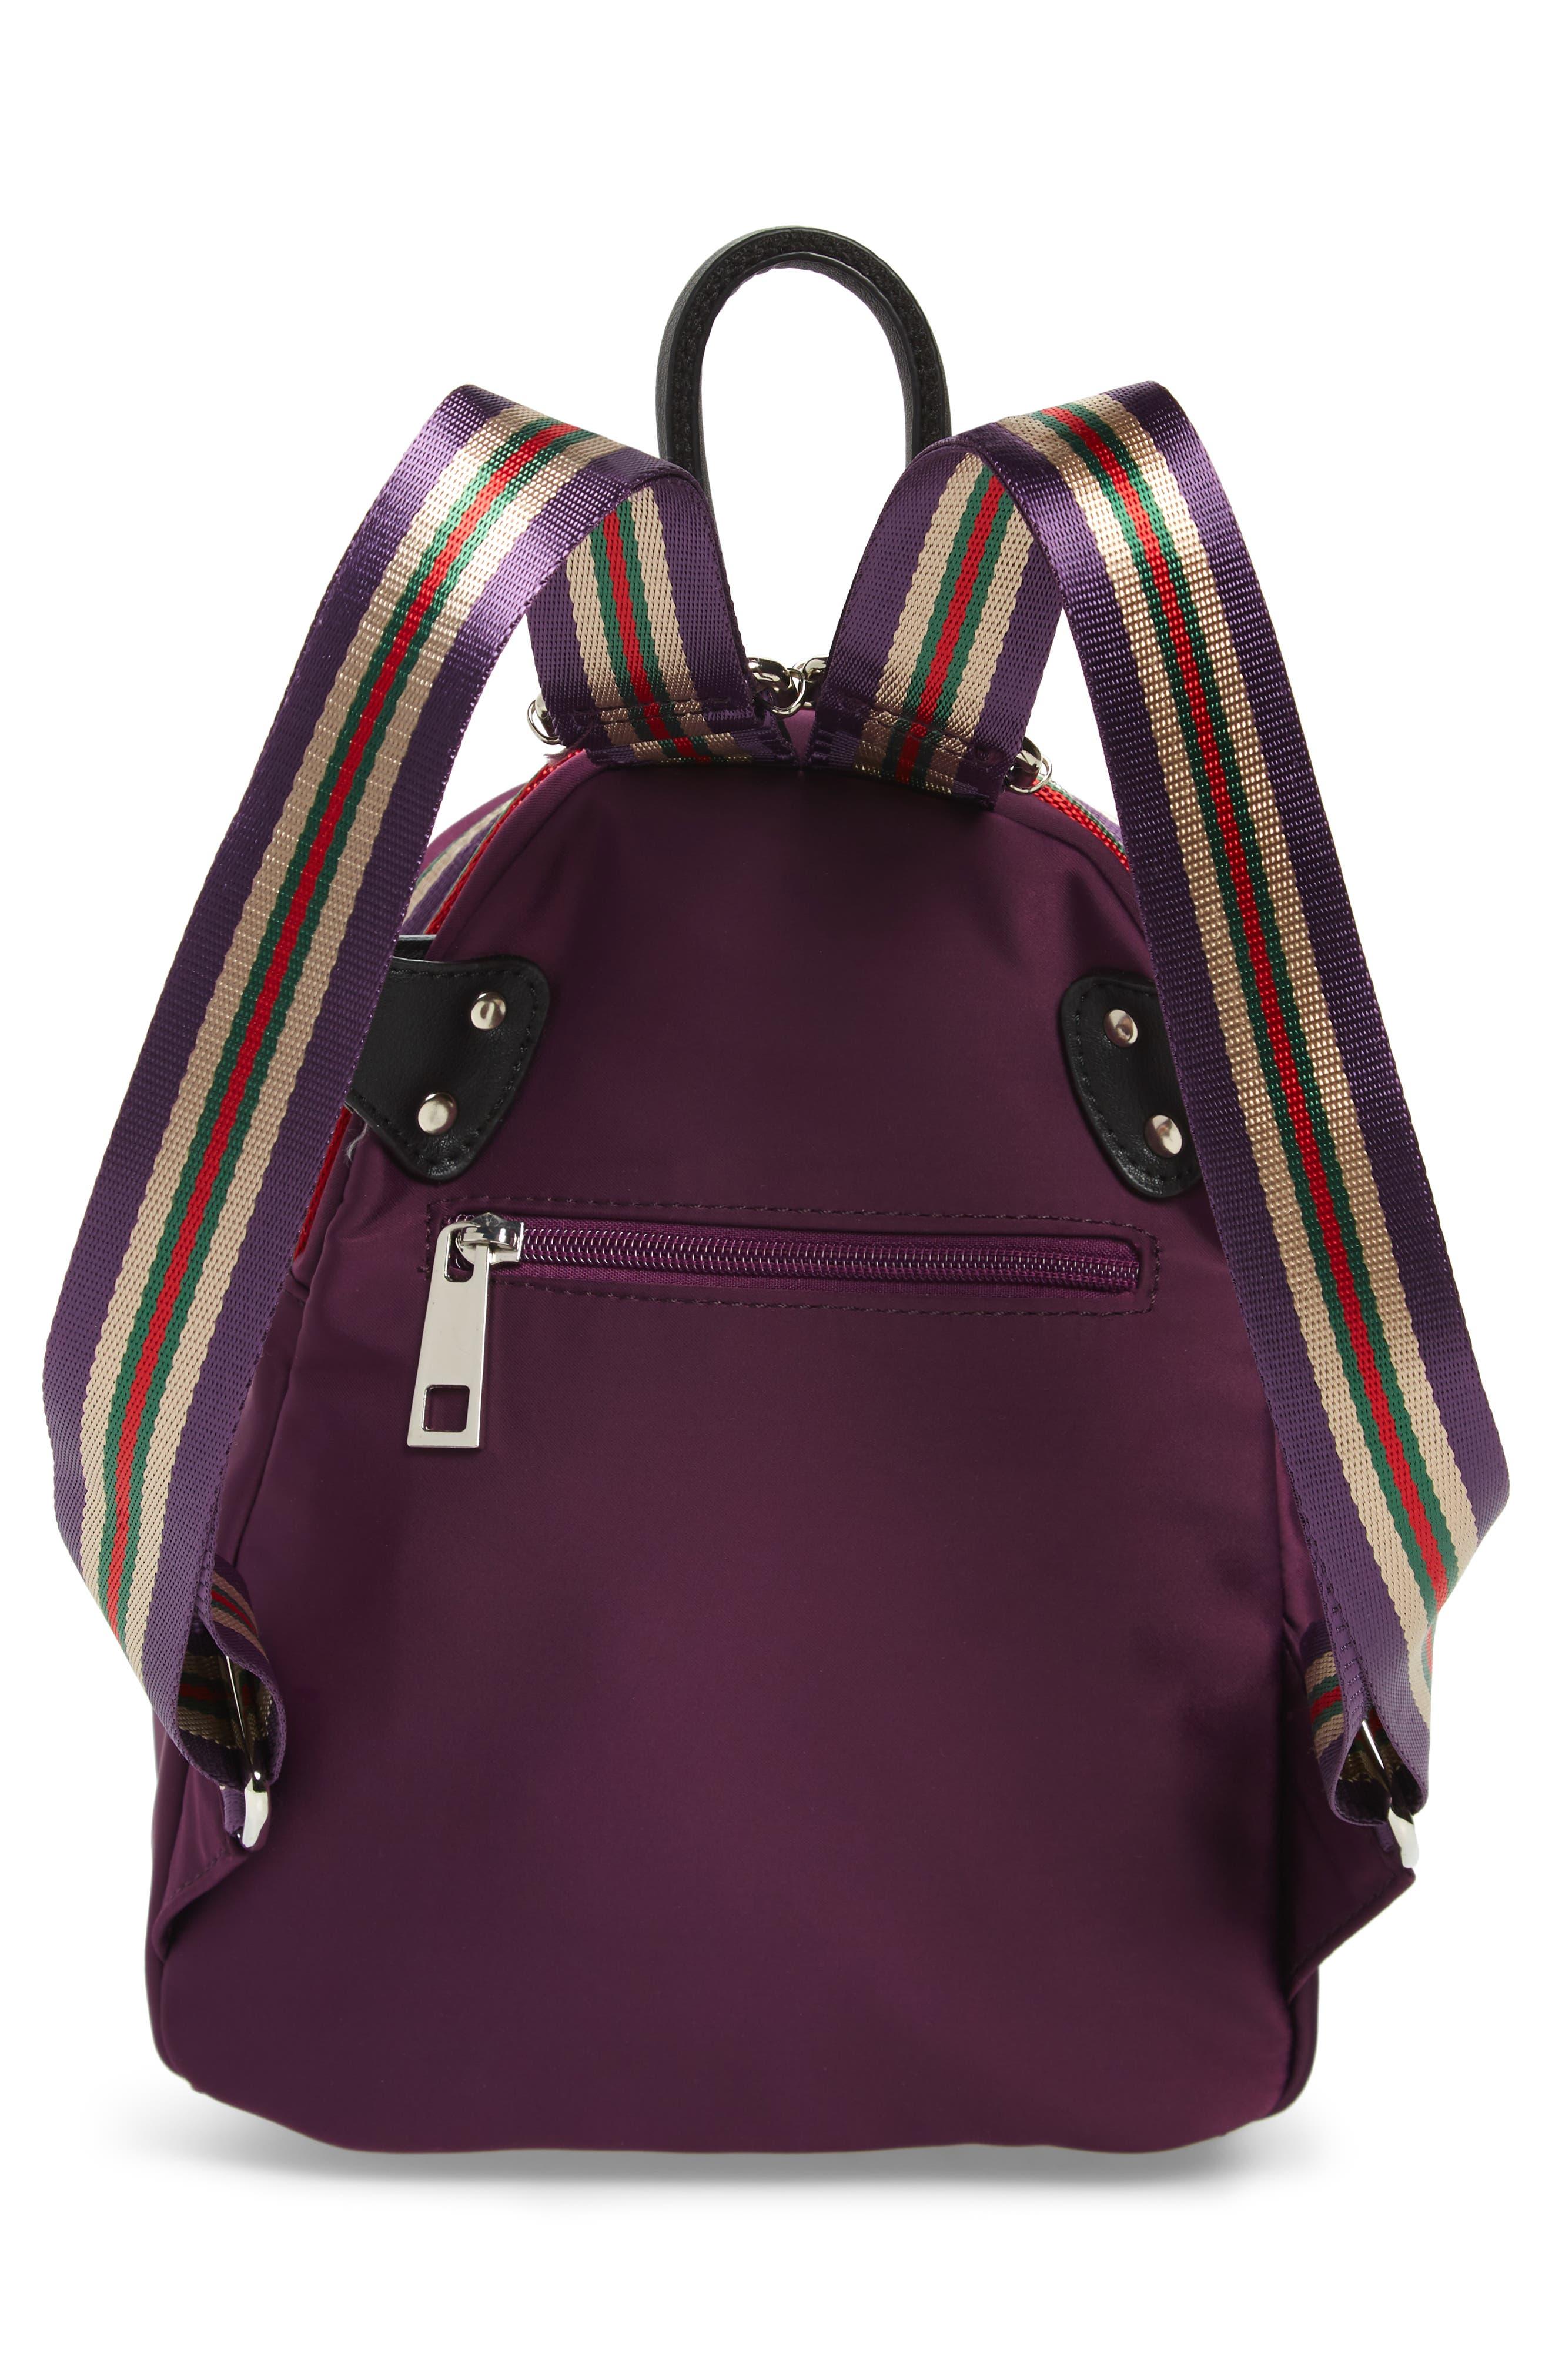 Satin Nylon & Webbing Convertible Backpack,                             Alternate thumbnail 4, color,                             PURPLE